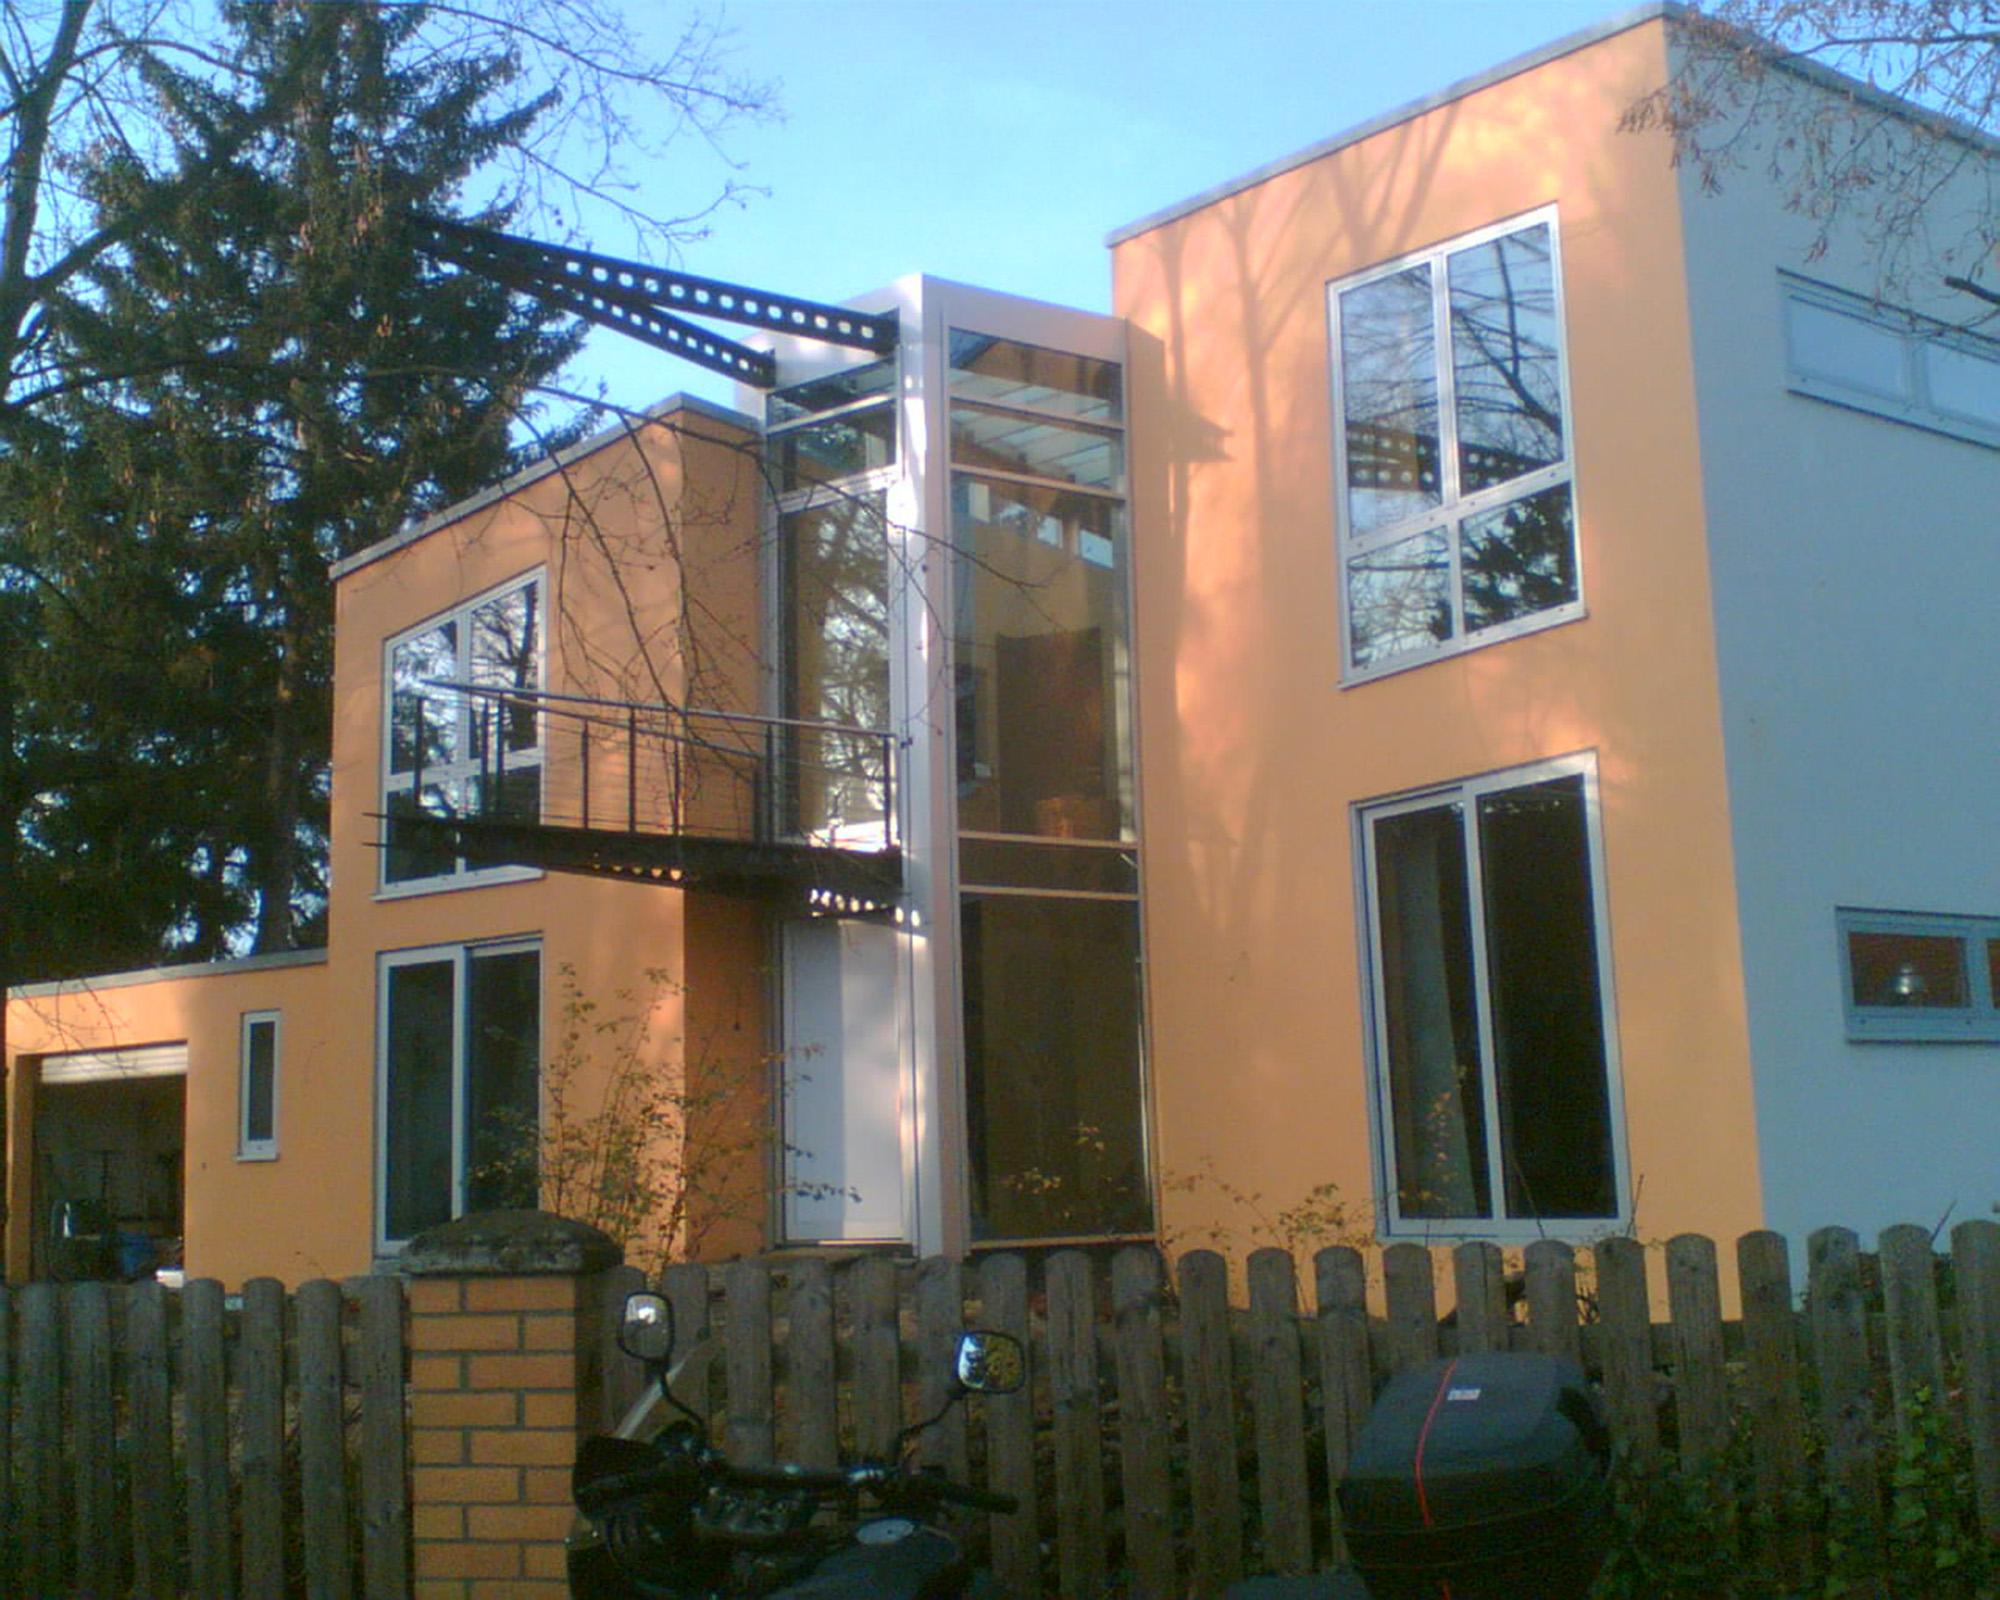 EFH - Aluminiumfenster mit Glasatrium, Glienecke